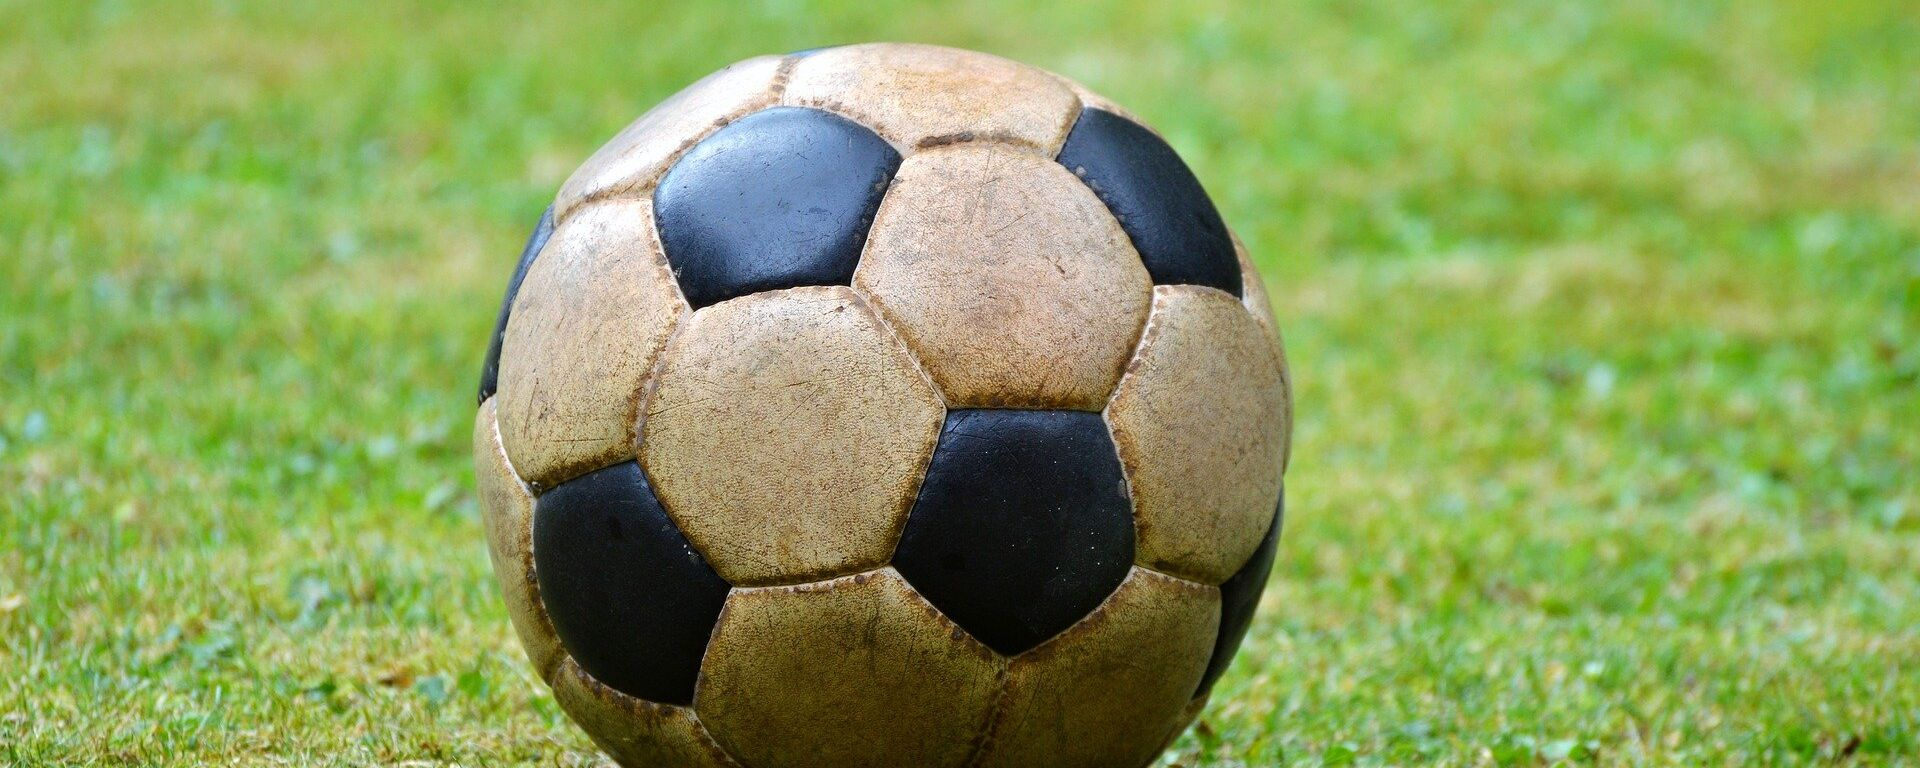 Balón de fútbol - Sputnik Mundo, 1920, 13.05.2021